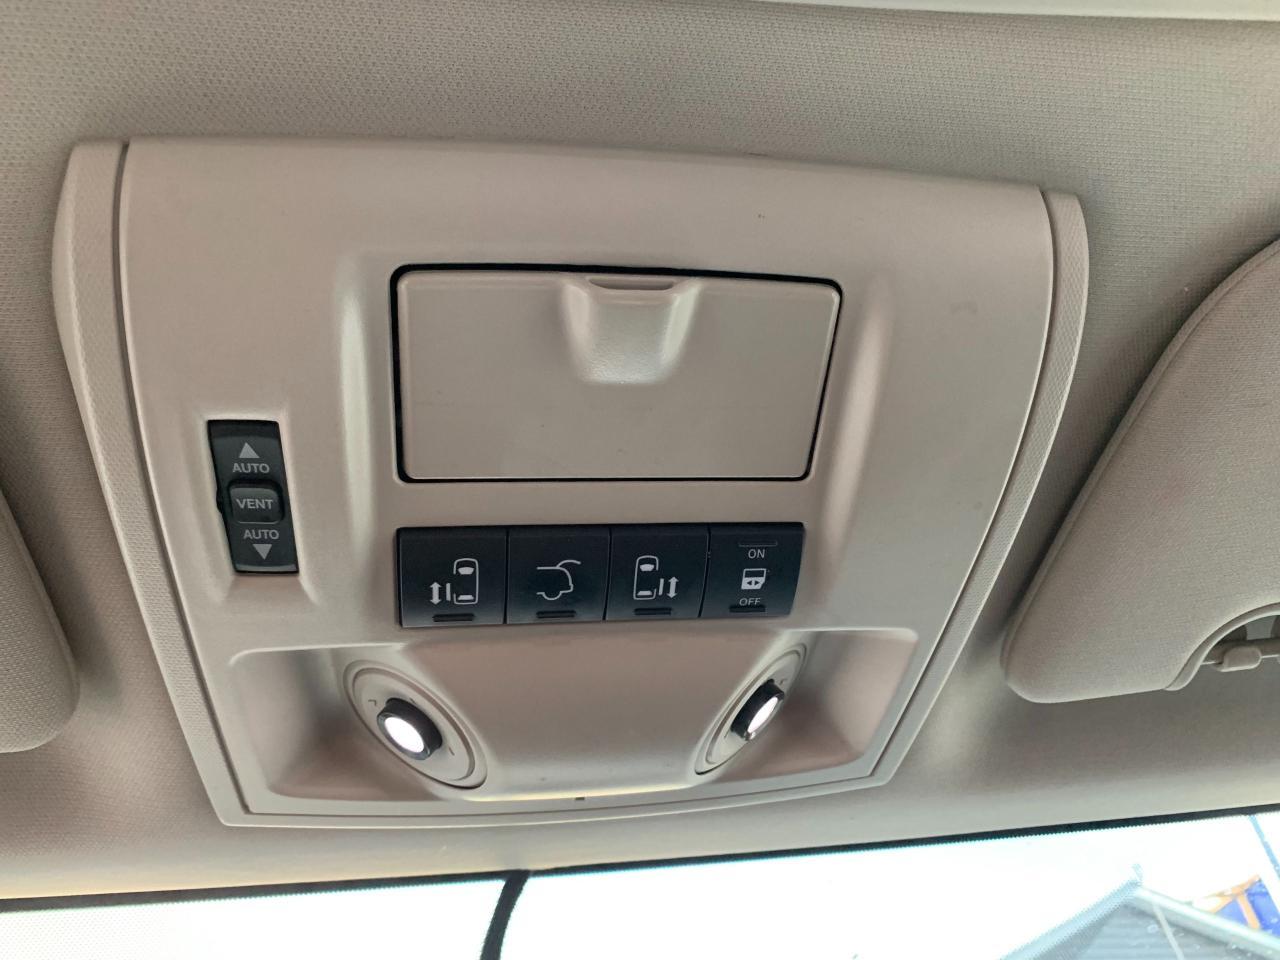 2012 Chrysler Town & Country NAV • Dual Screen DVD • Power Doors!